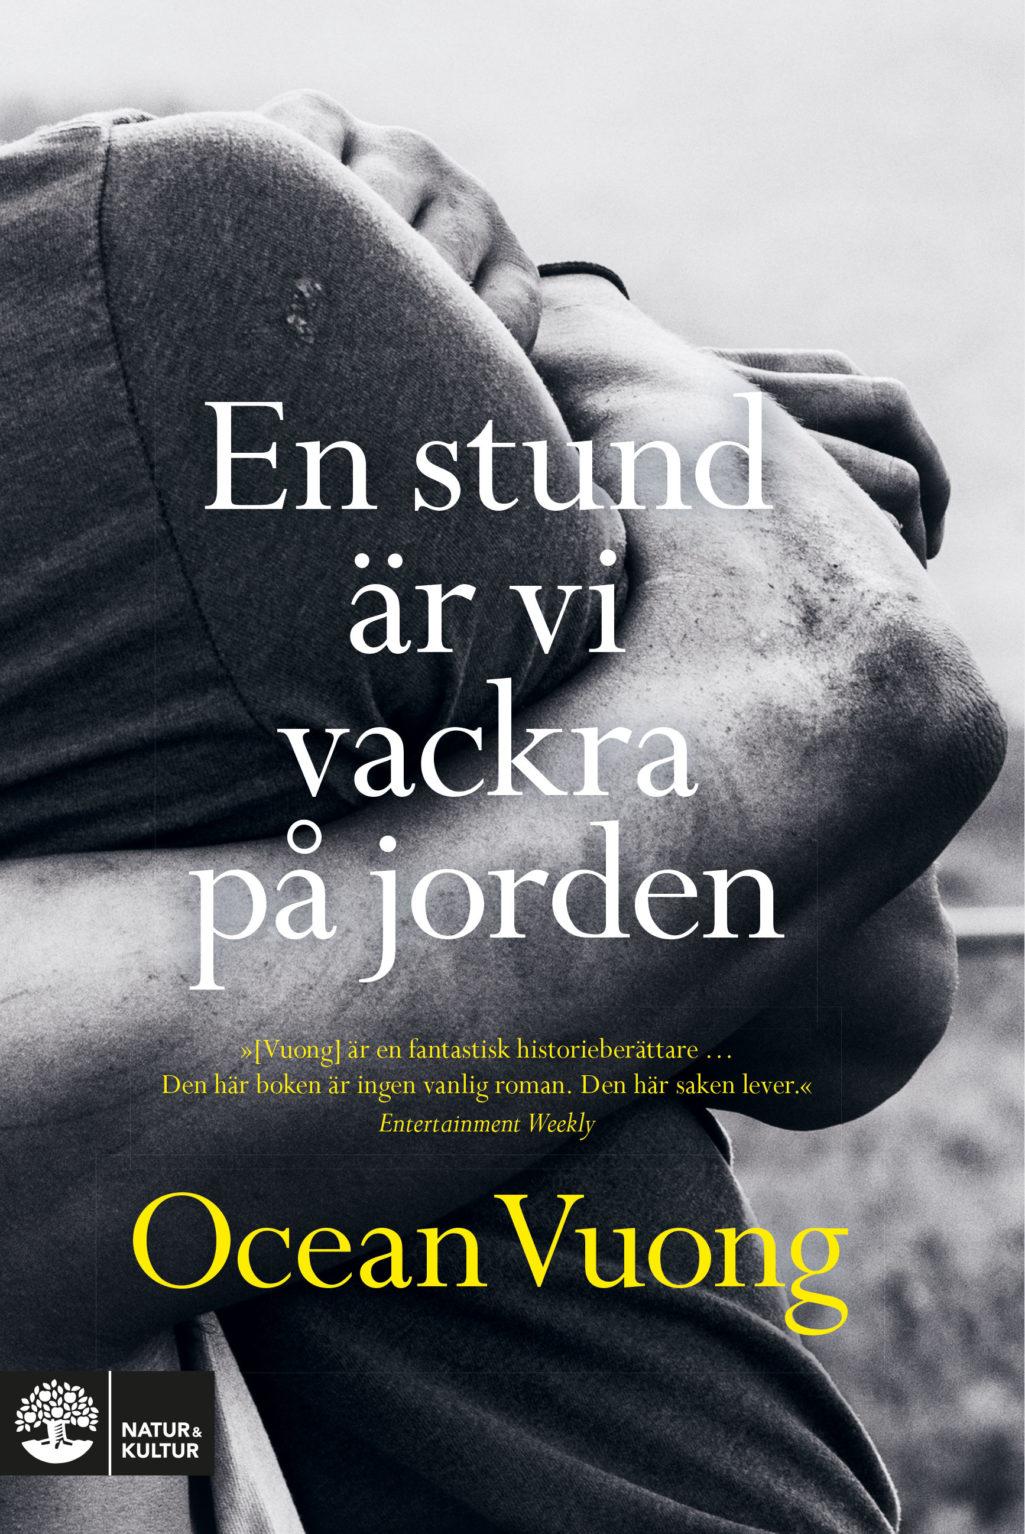 en-stund-ar-vi-vackra-pa-jorden-ocean-voung-boktips-omslag